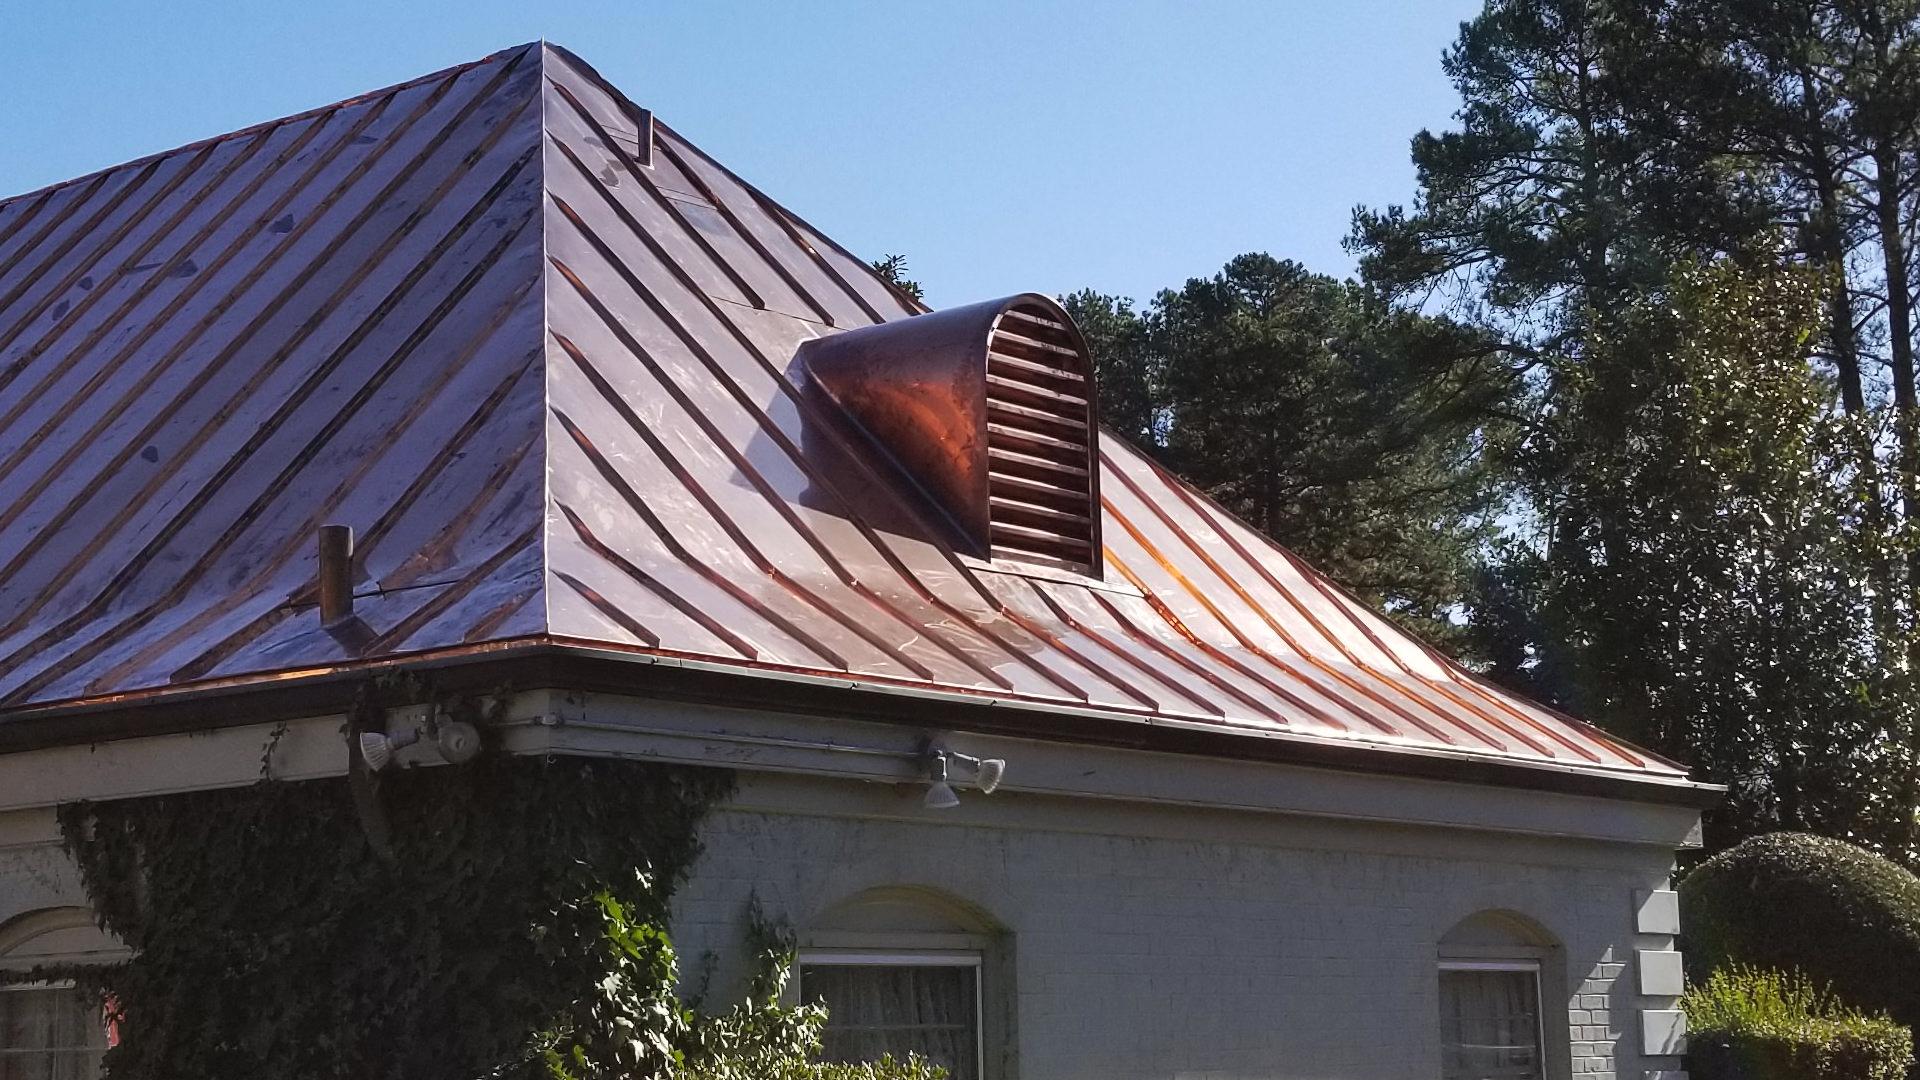 Custom made copper barrel dormer on metal roof